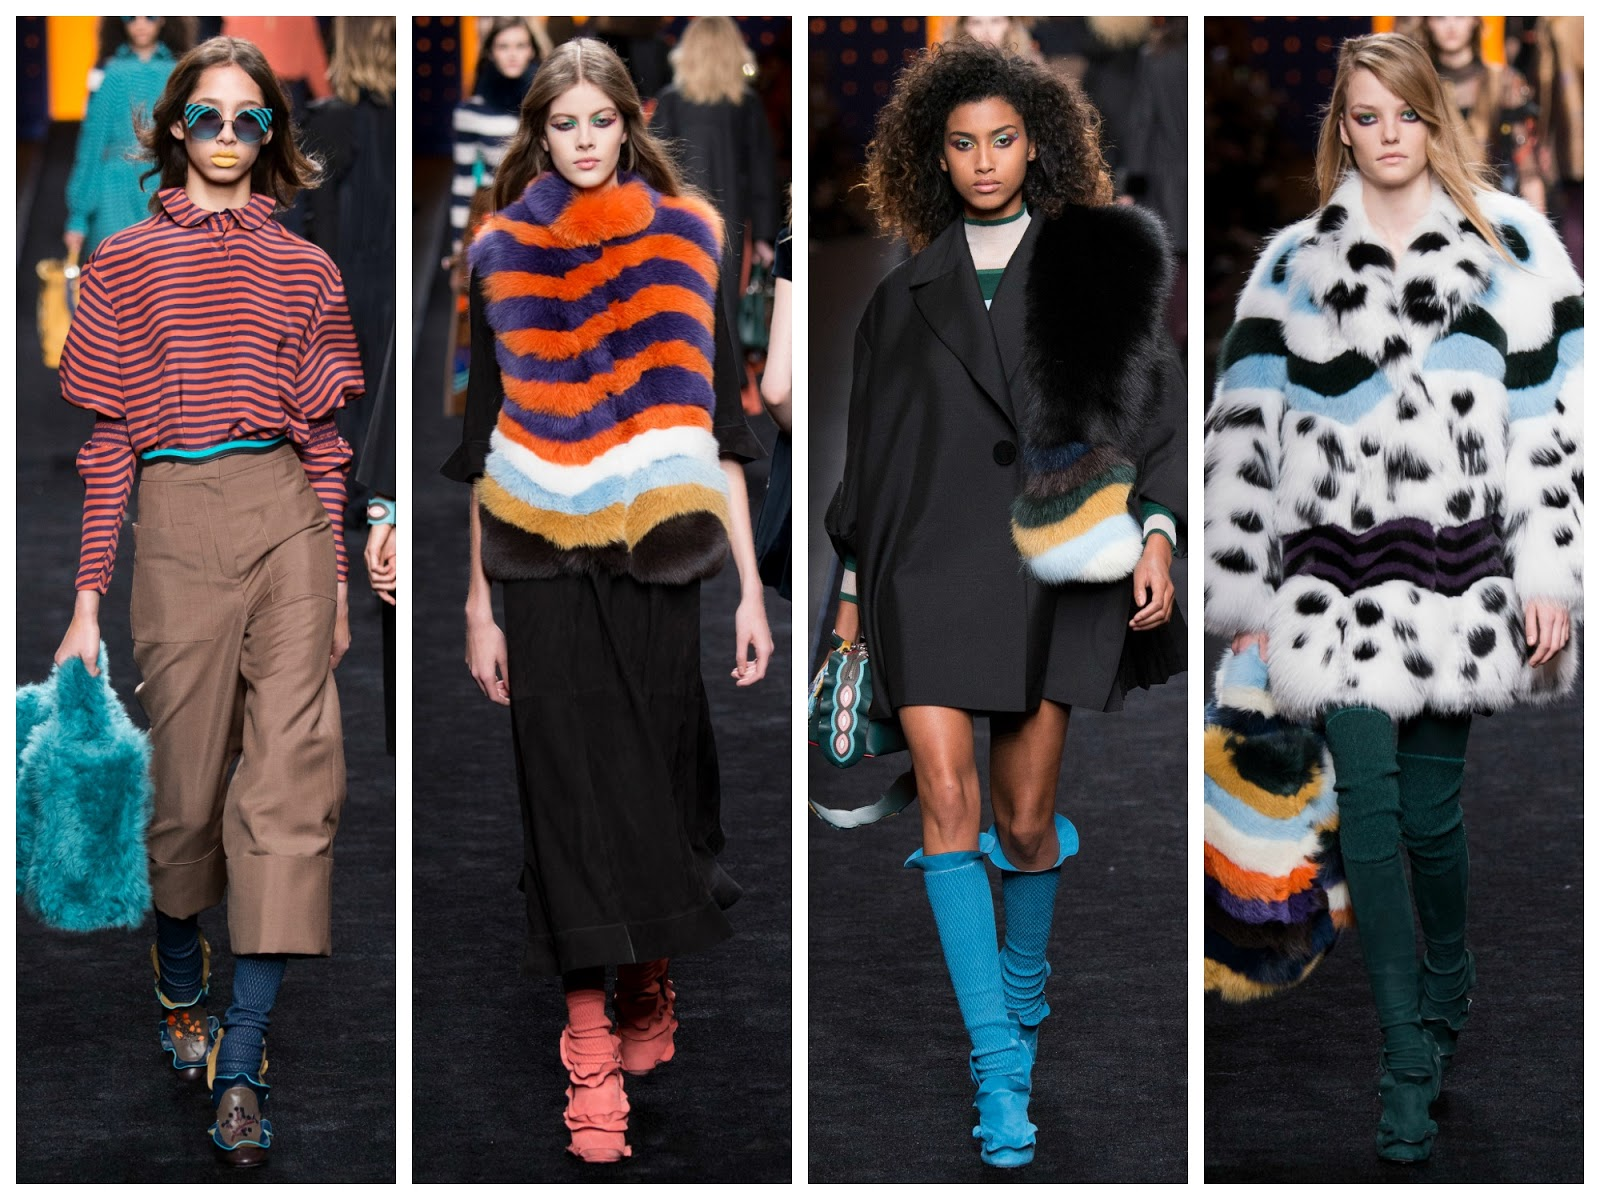 fendi-fall-winter-2016-fashion-show-collection-milan